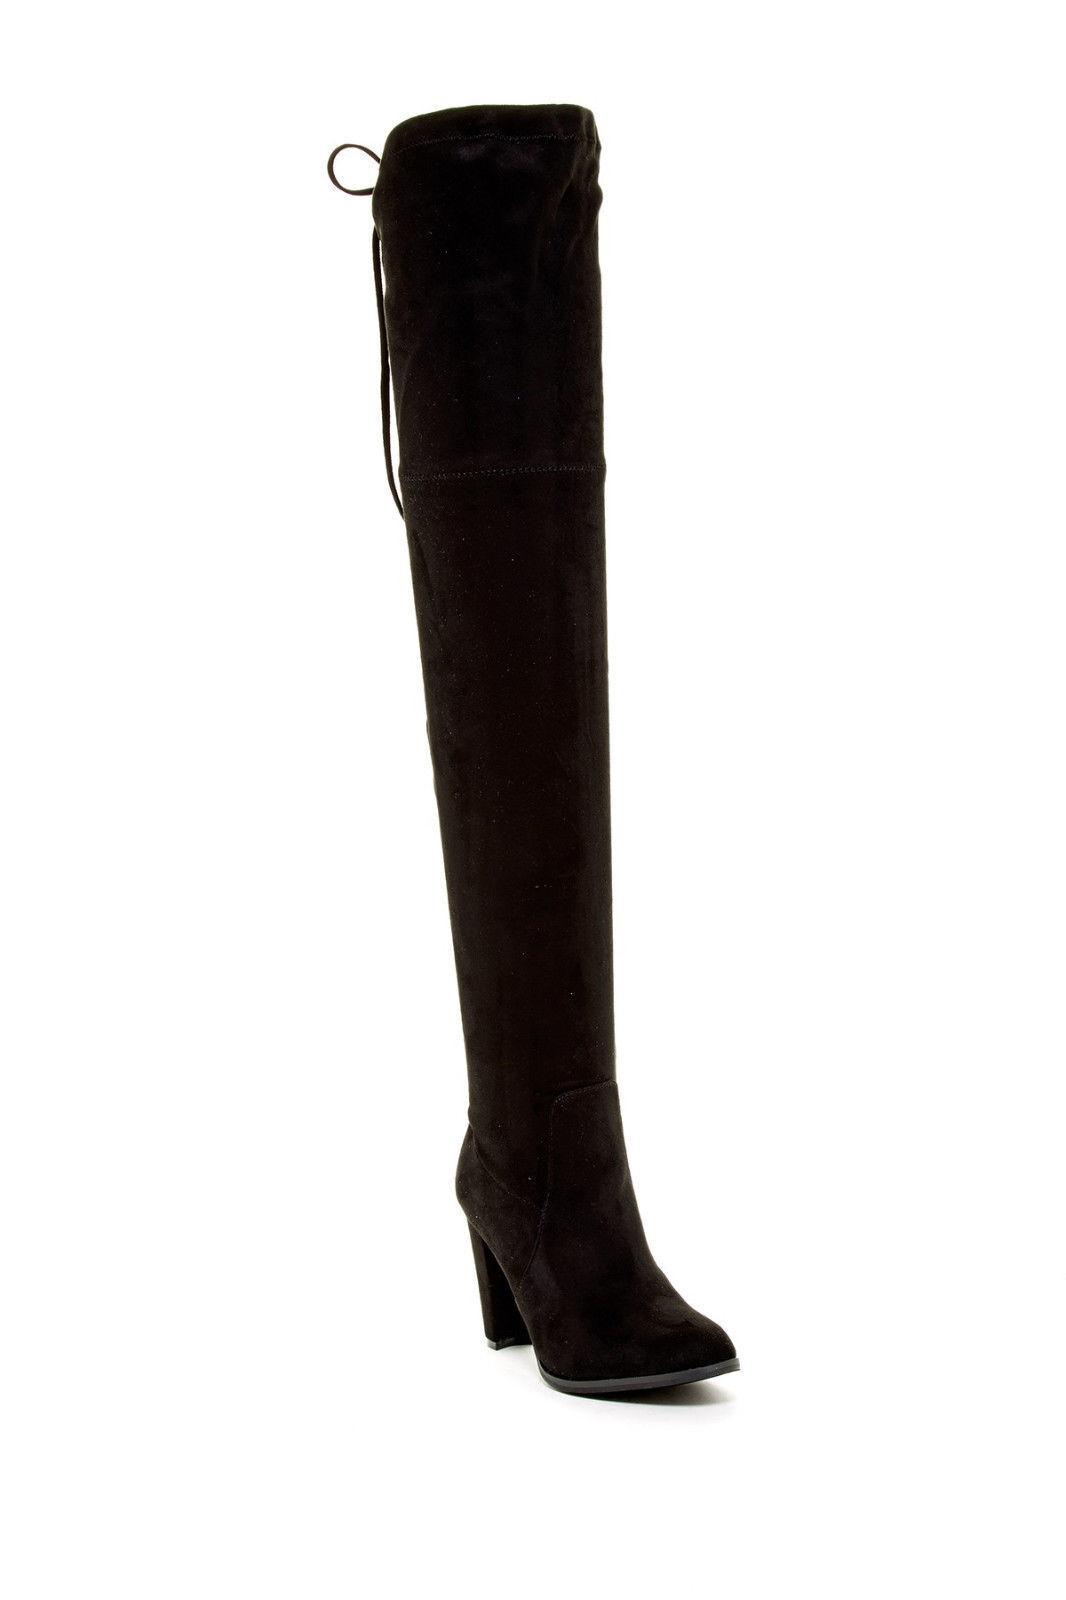 Catherine Malandrino Sorcha Suede Over-the-Knee 10 Black Boot New